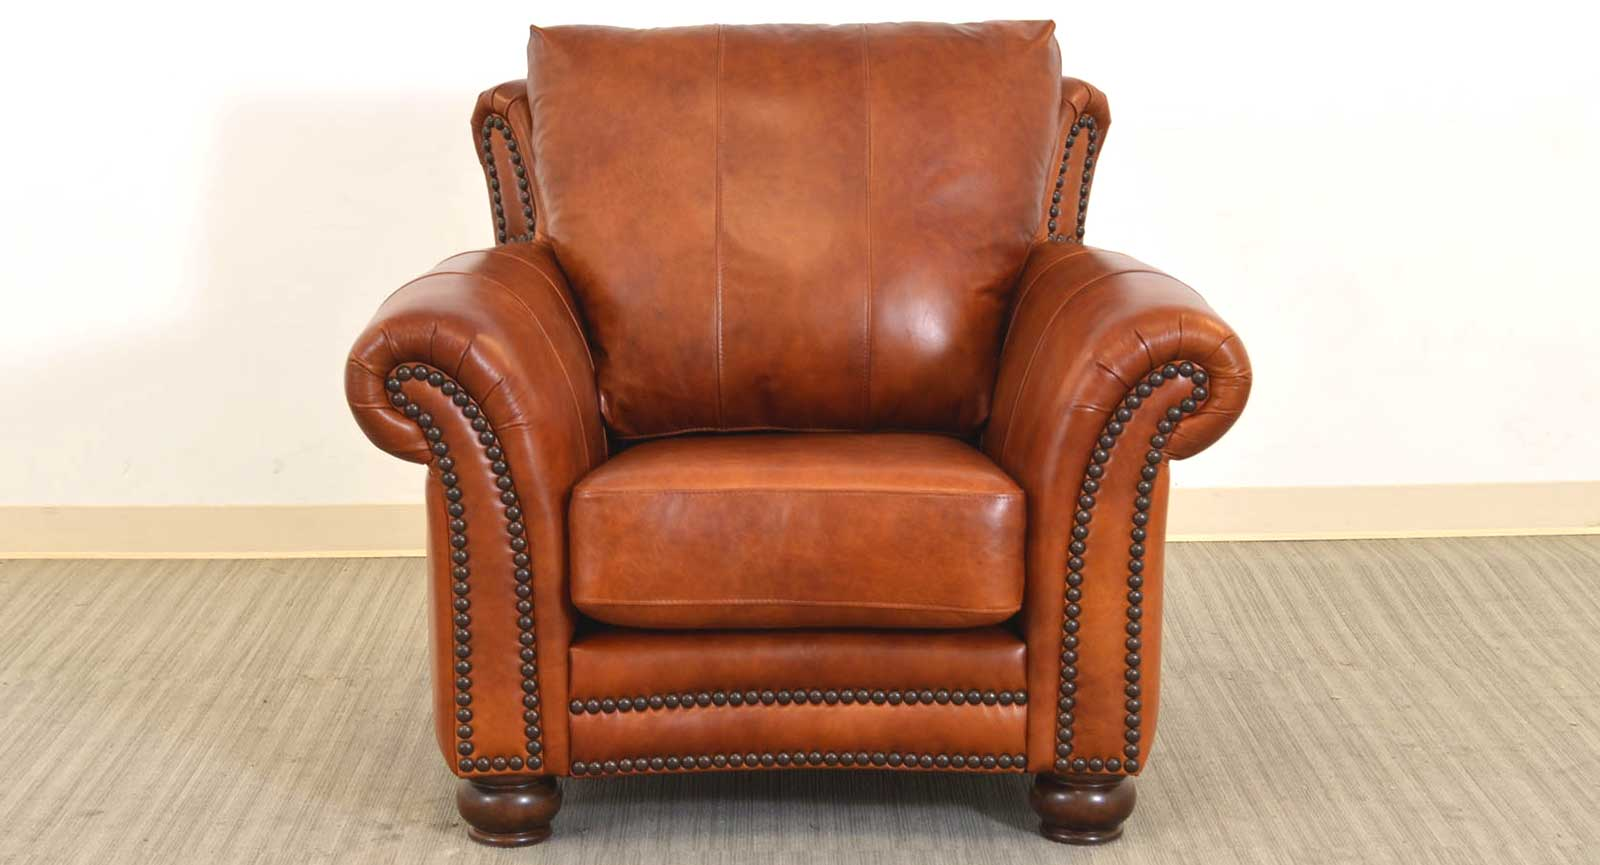 Highlander Chair